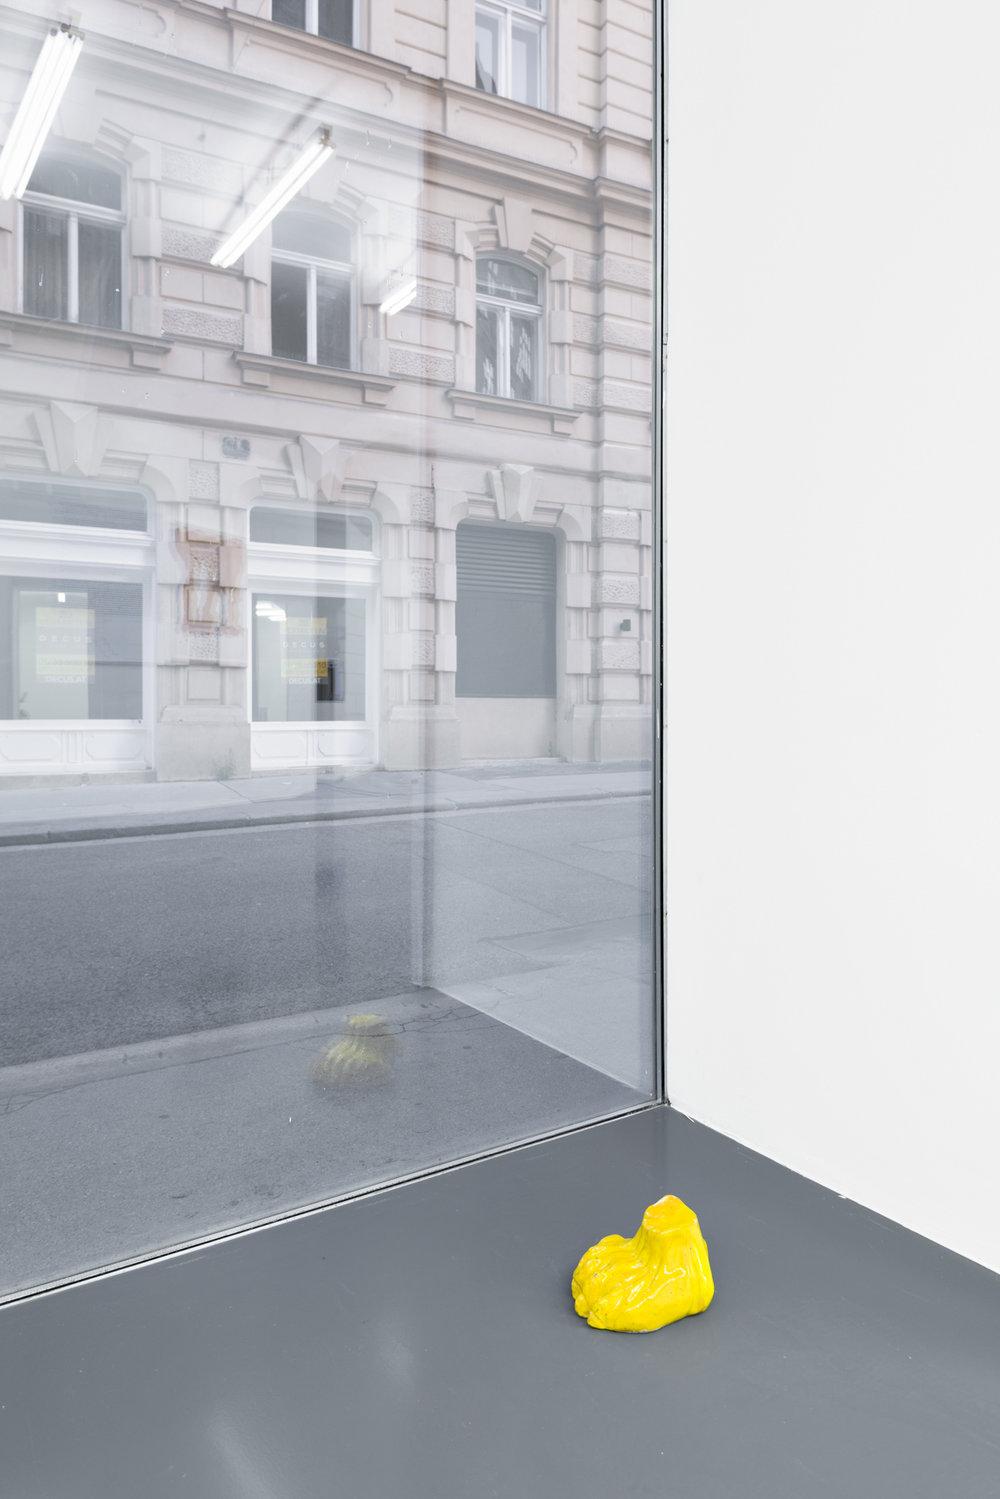 Lena Henke, The fatal net, 2016 Glazed ceramic, 20 x 15.5 x 12 cm, Courtesy: Galerie Emanuel Layr